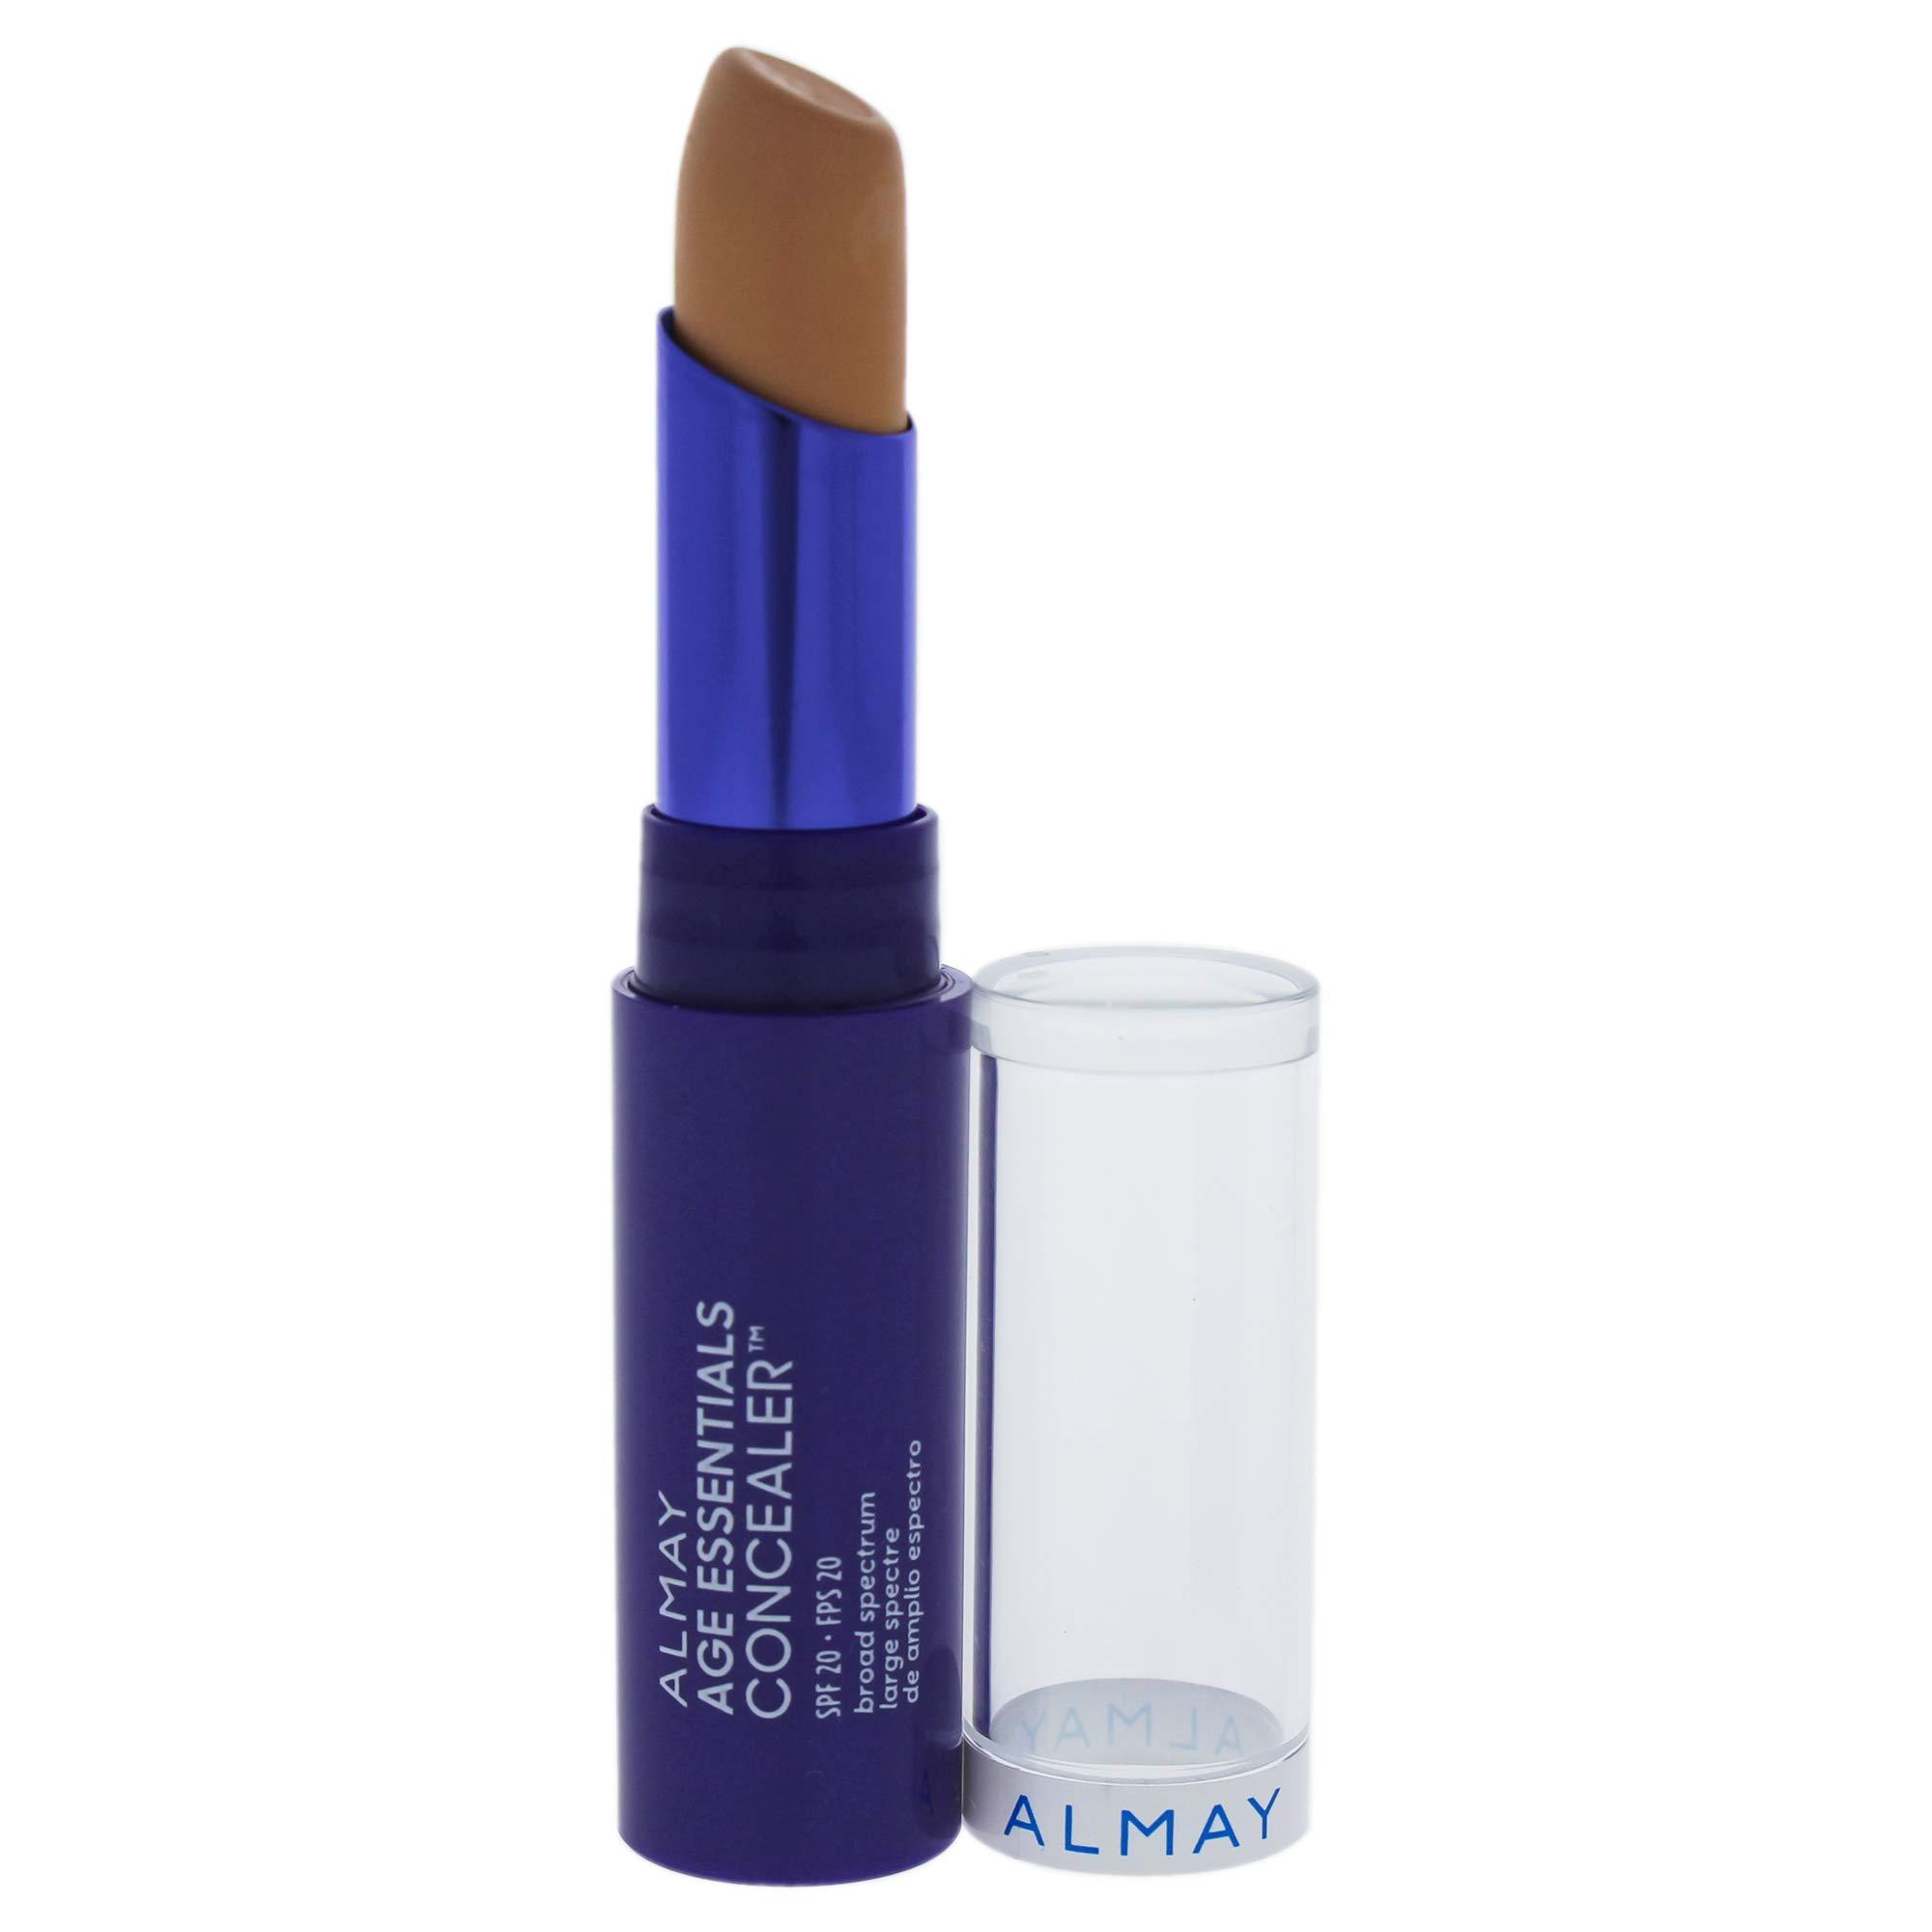 Almay Age Essentials Concealer - 200 Light-medium By Almay for Women - 0.13 Oz Concealer, 0.13 Oz by Almay